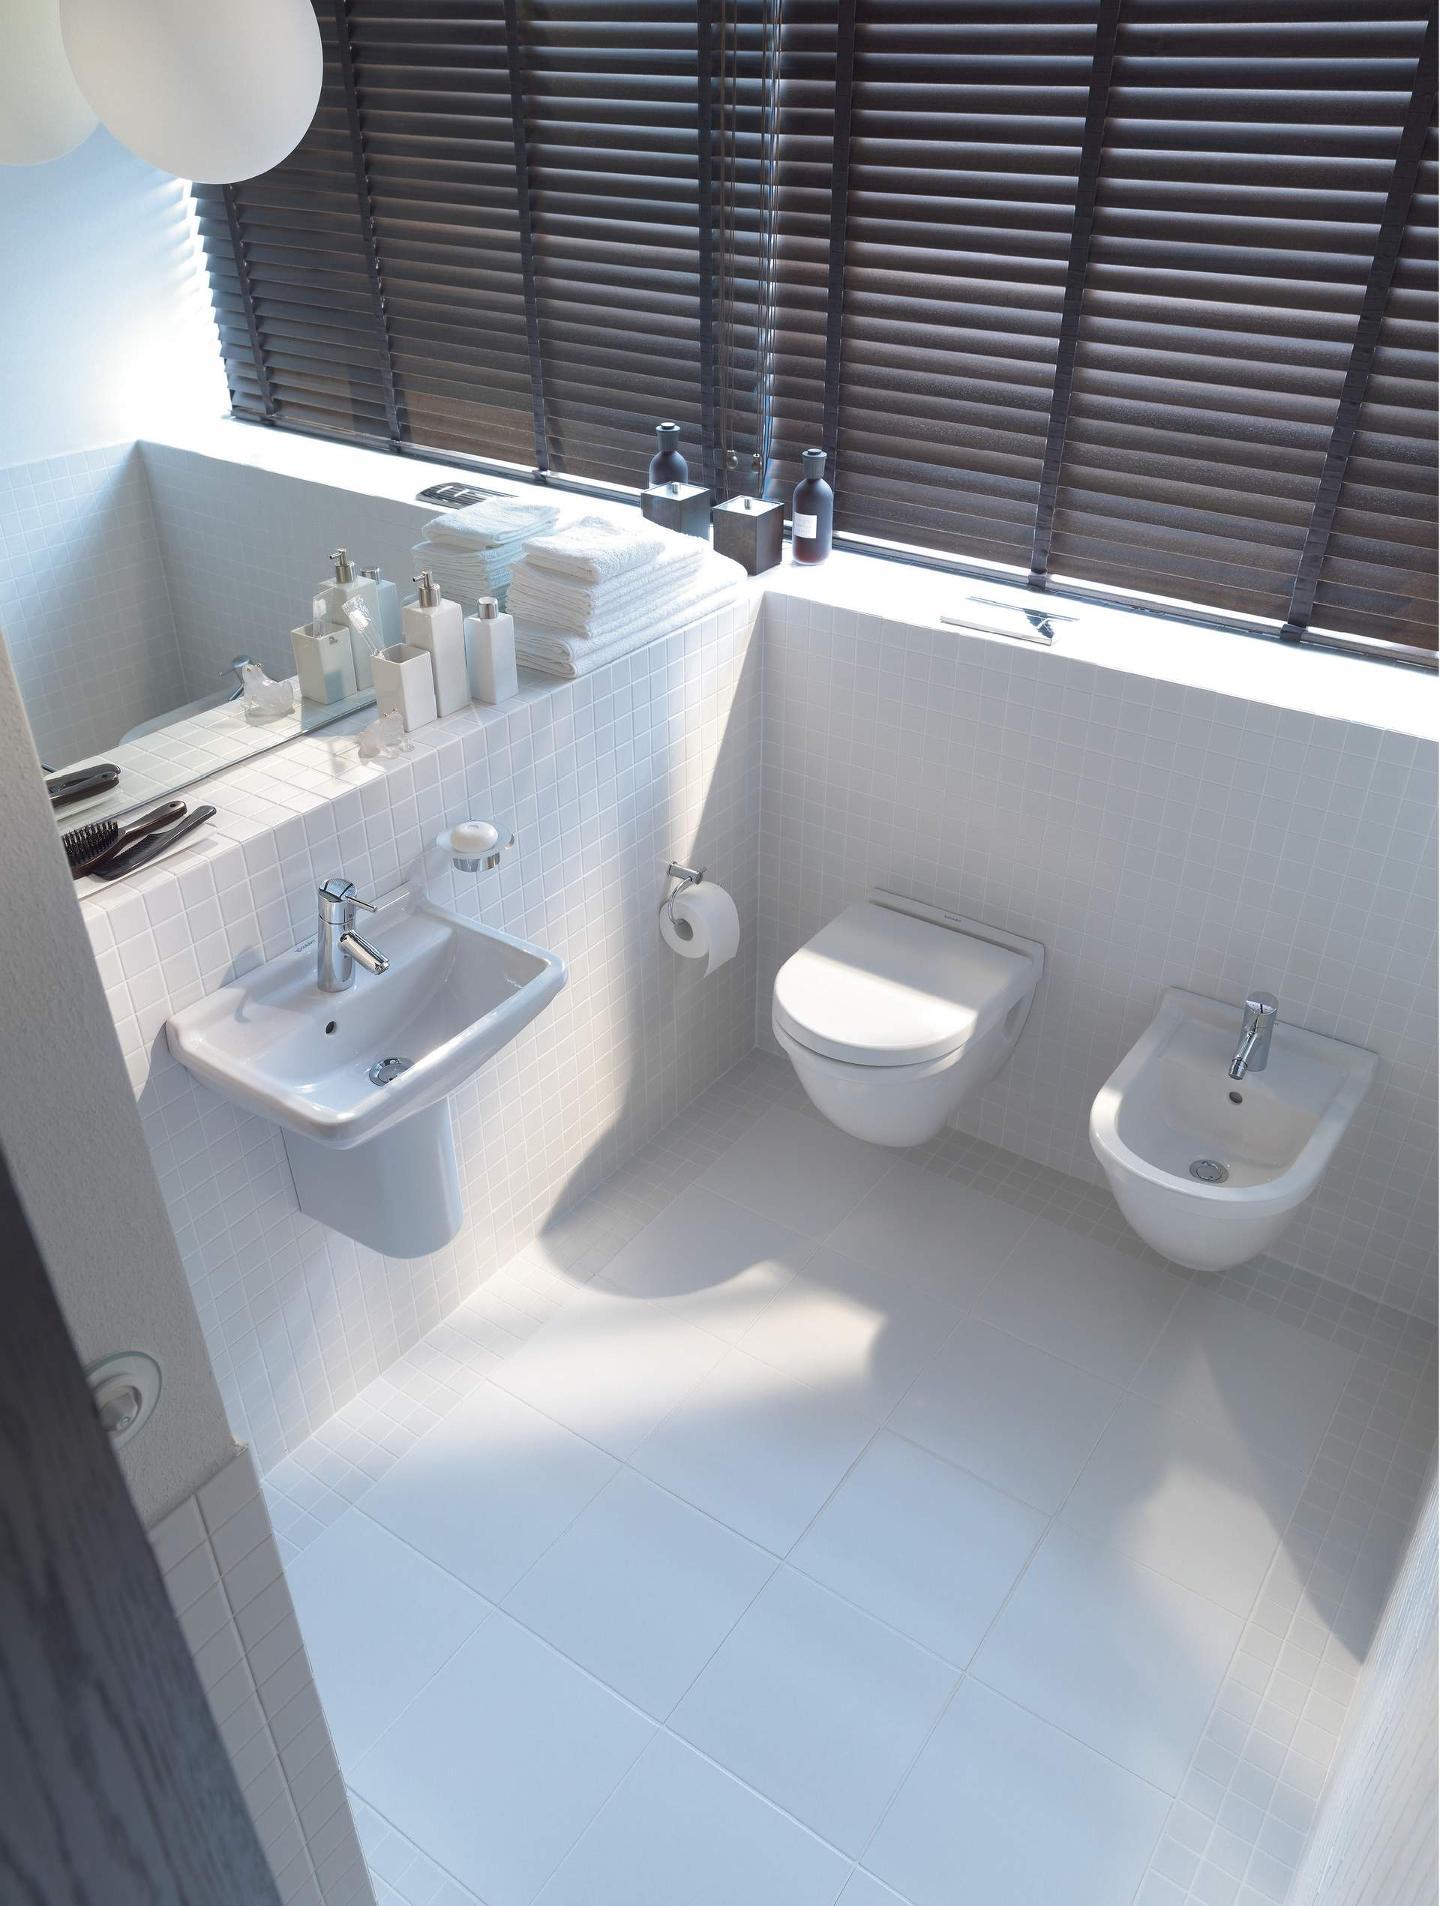 Duravit Starck 3 Toilets Washhbasins More Parts Diagram For Innovations Single Handle Bathroom Faucet Models 540